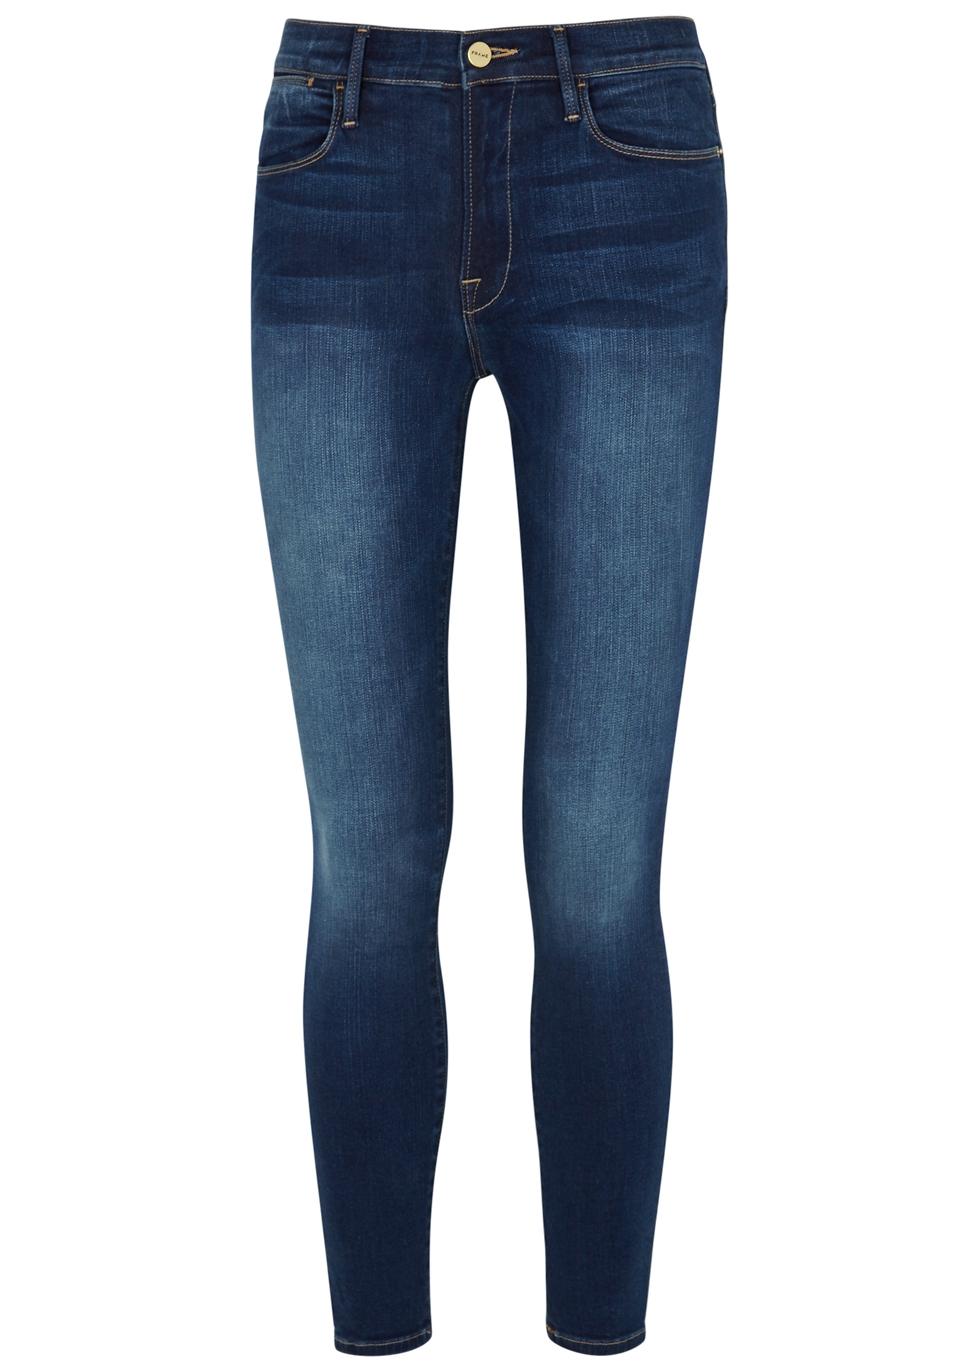 Le High Skinny dark blue jeans